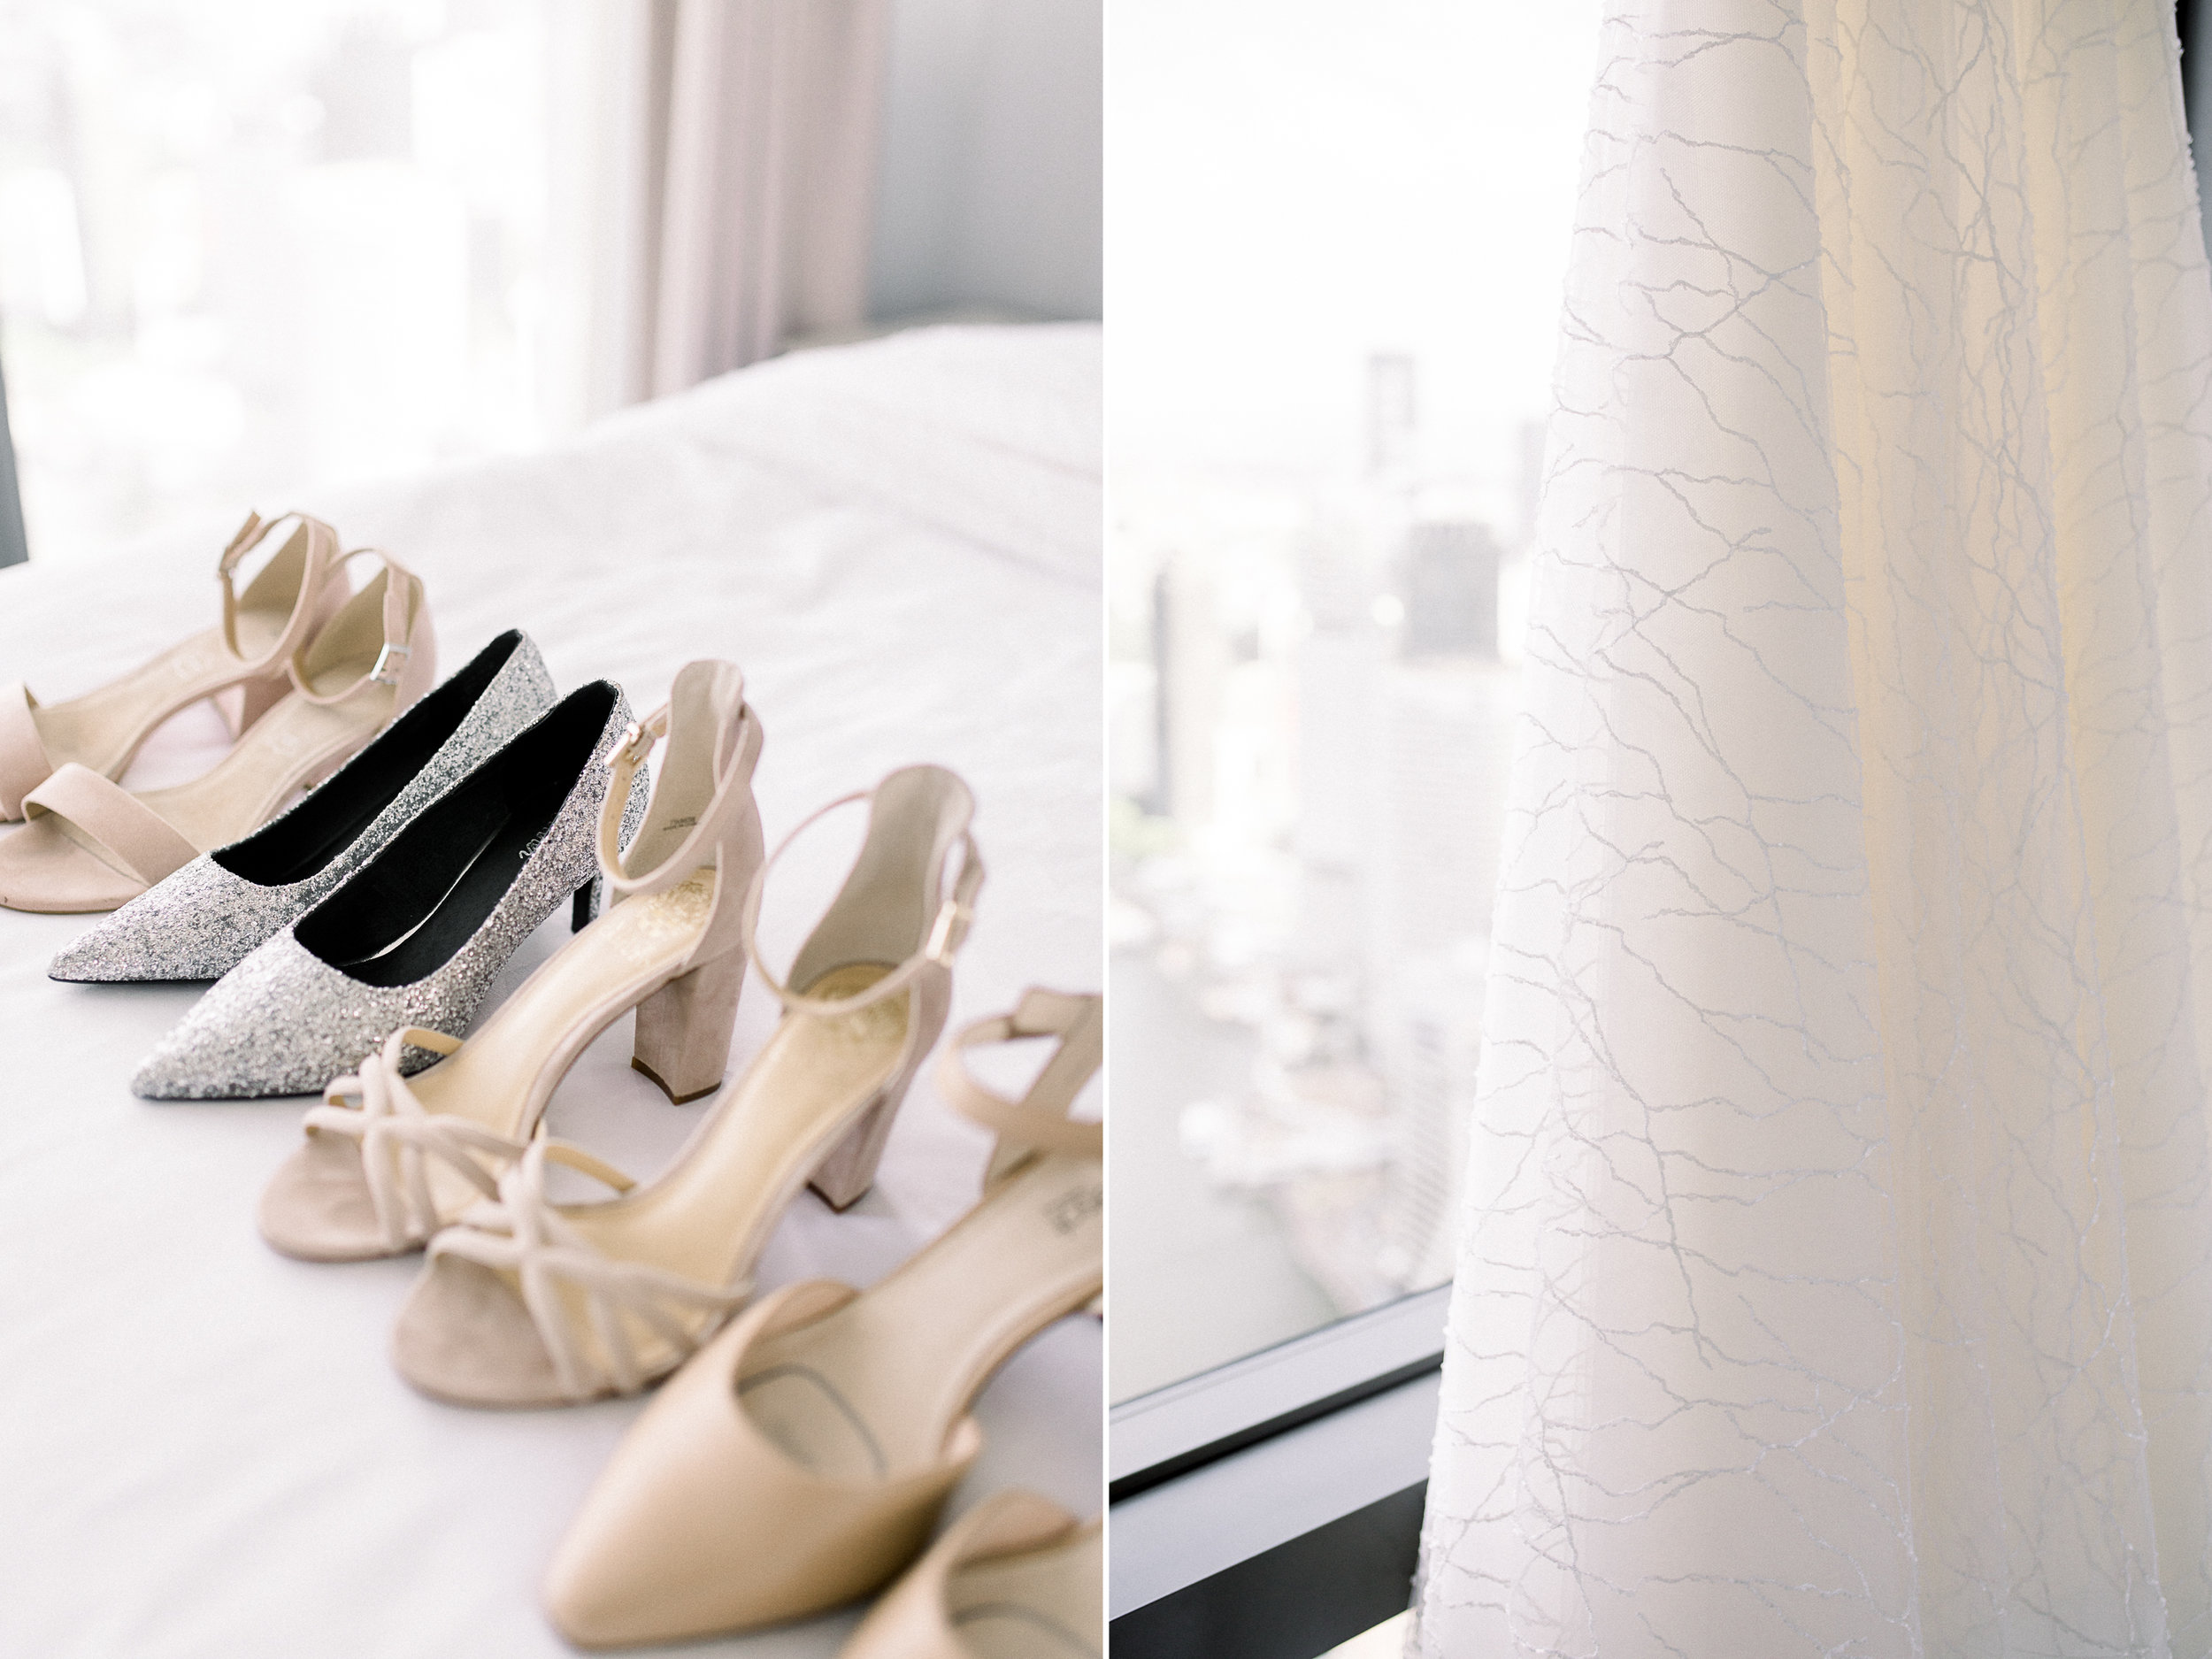 brisbane-city-refinery-wedding-photography-film-4.jpg